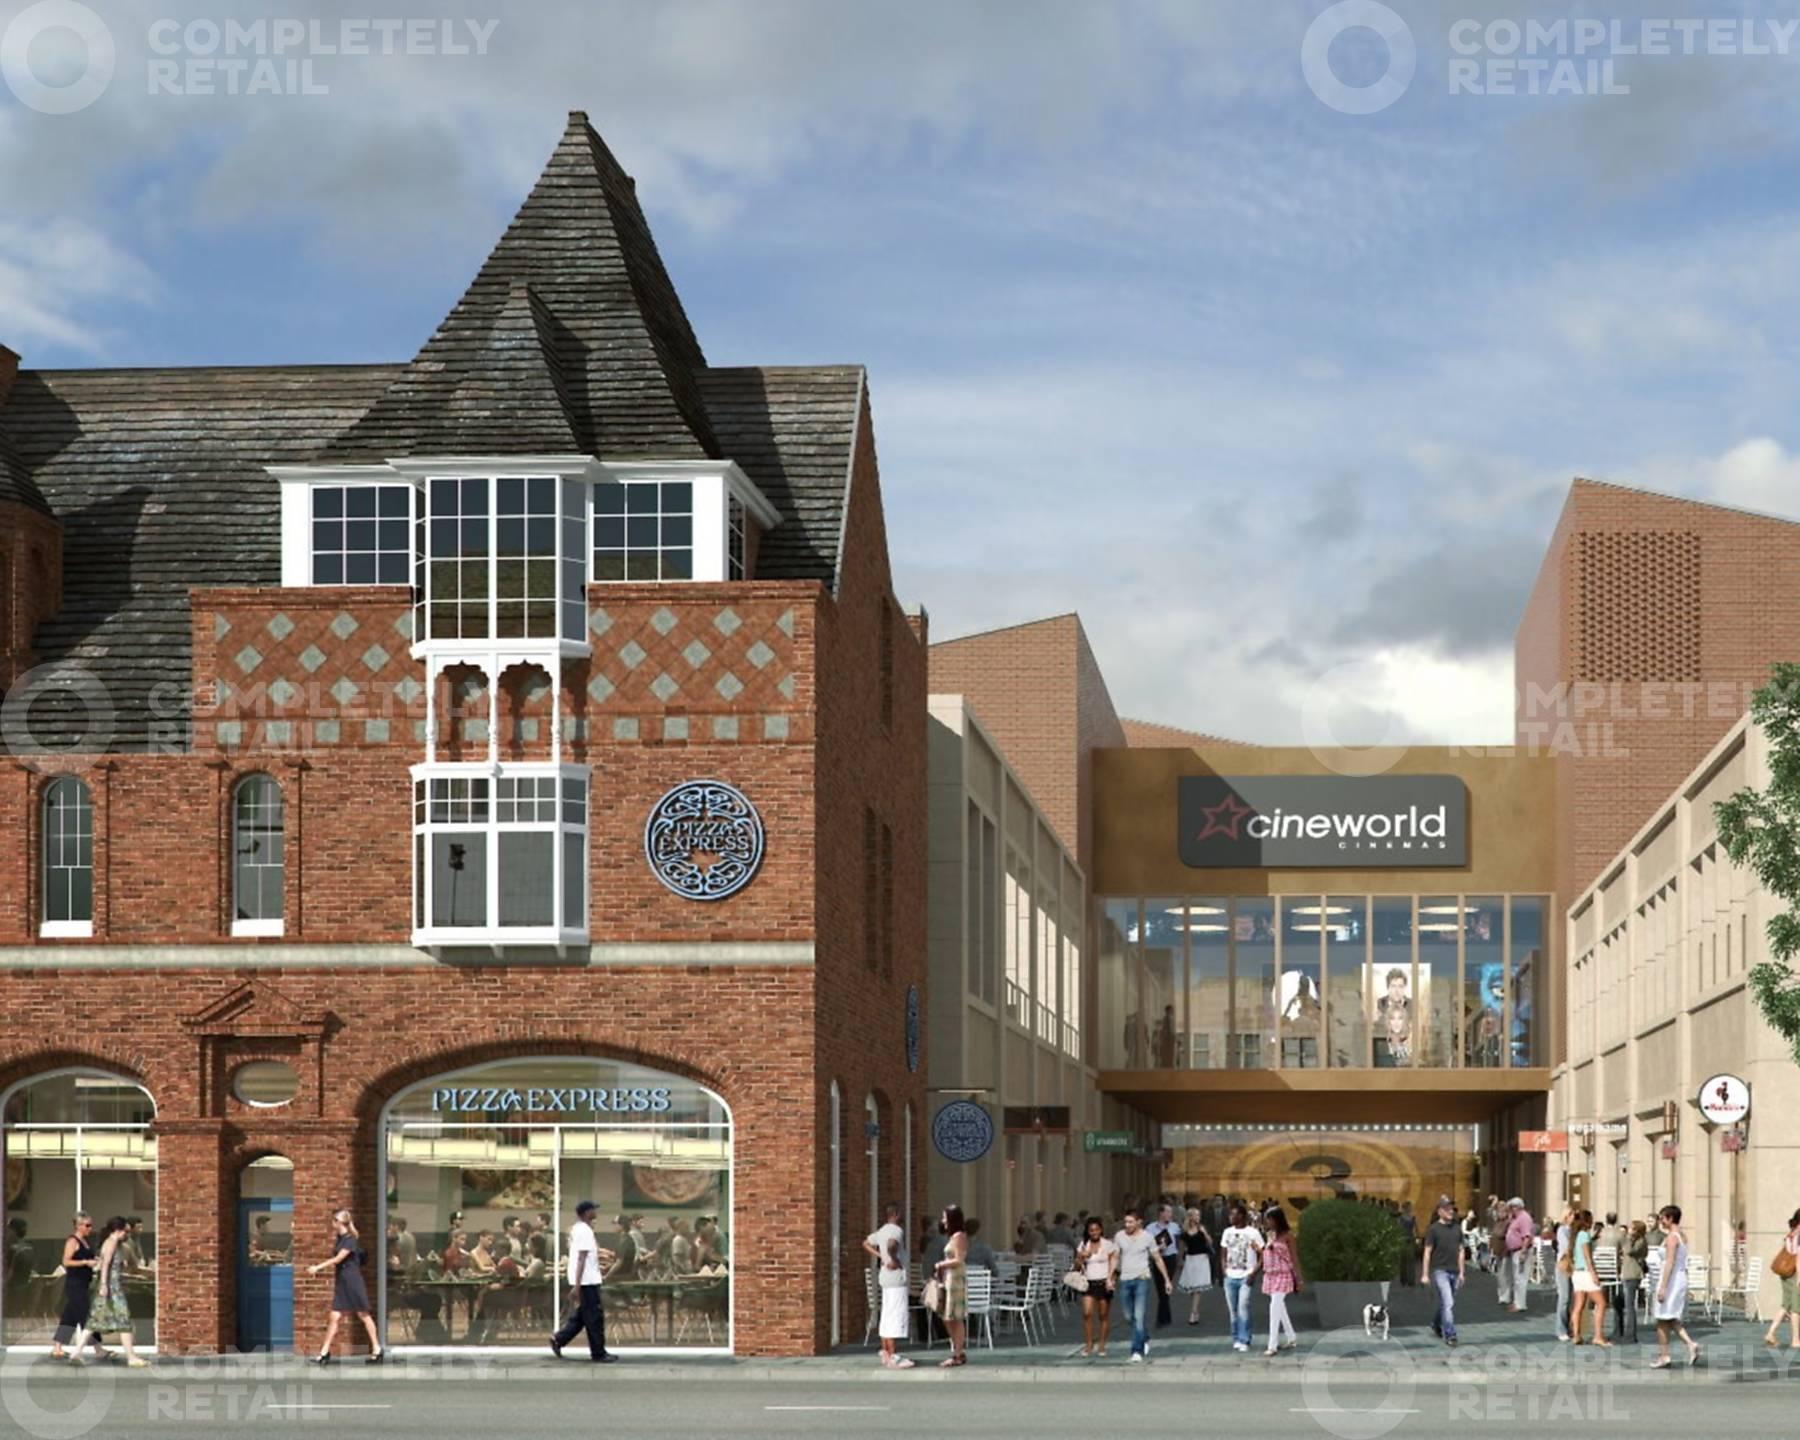 Baxter Gate Retail Park Loughborough Completely Property